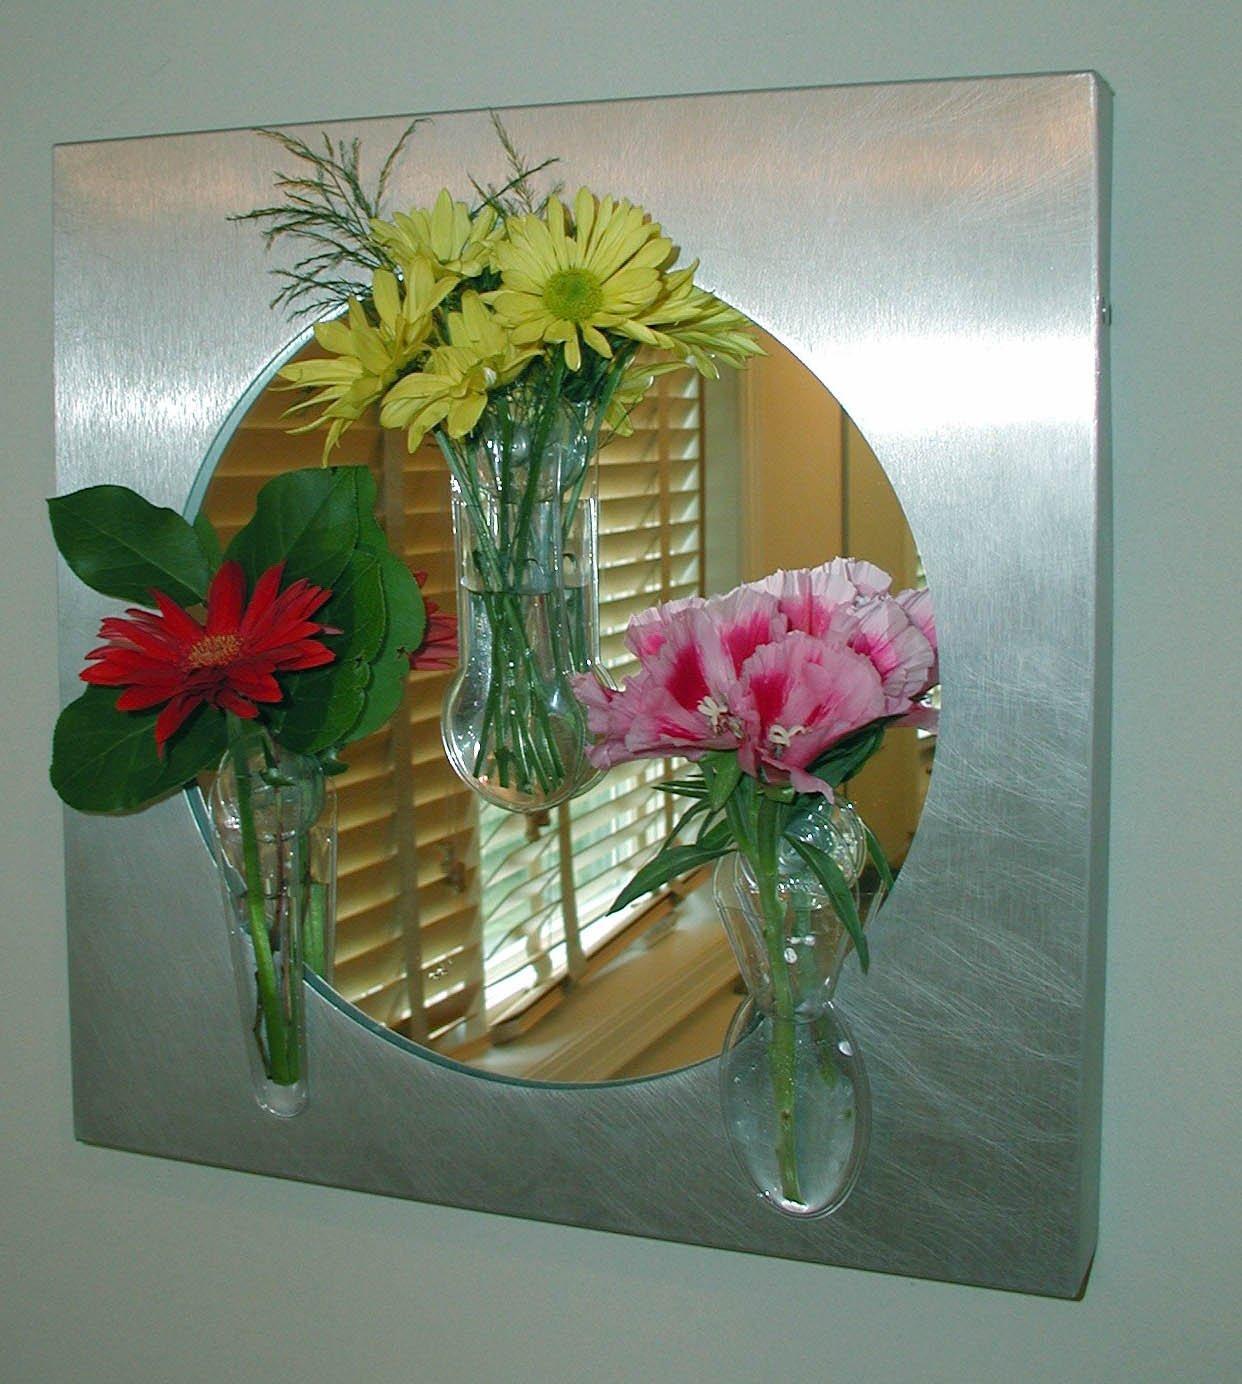 Amazon.com: Vinyl - Decorative Vases / Decorative Accessories